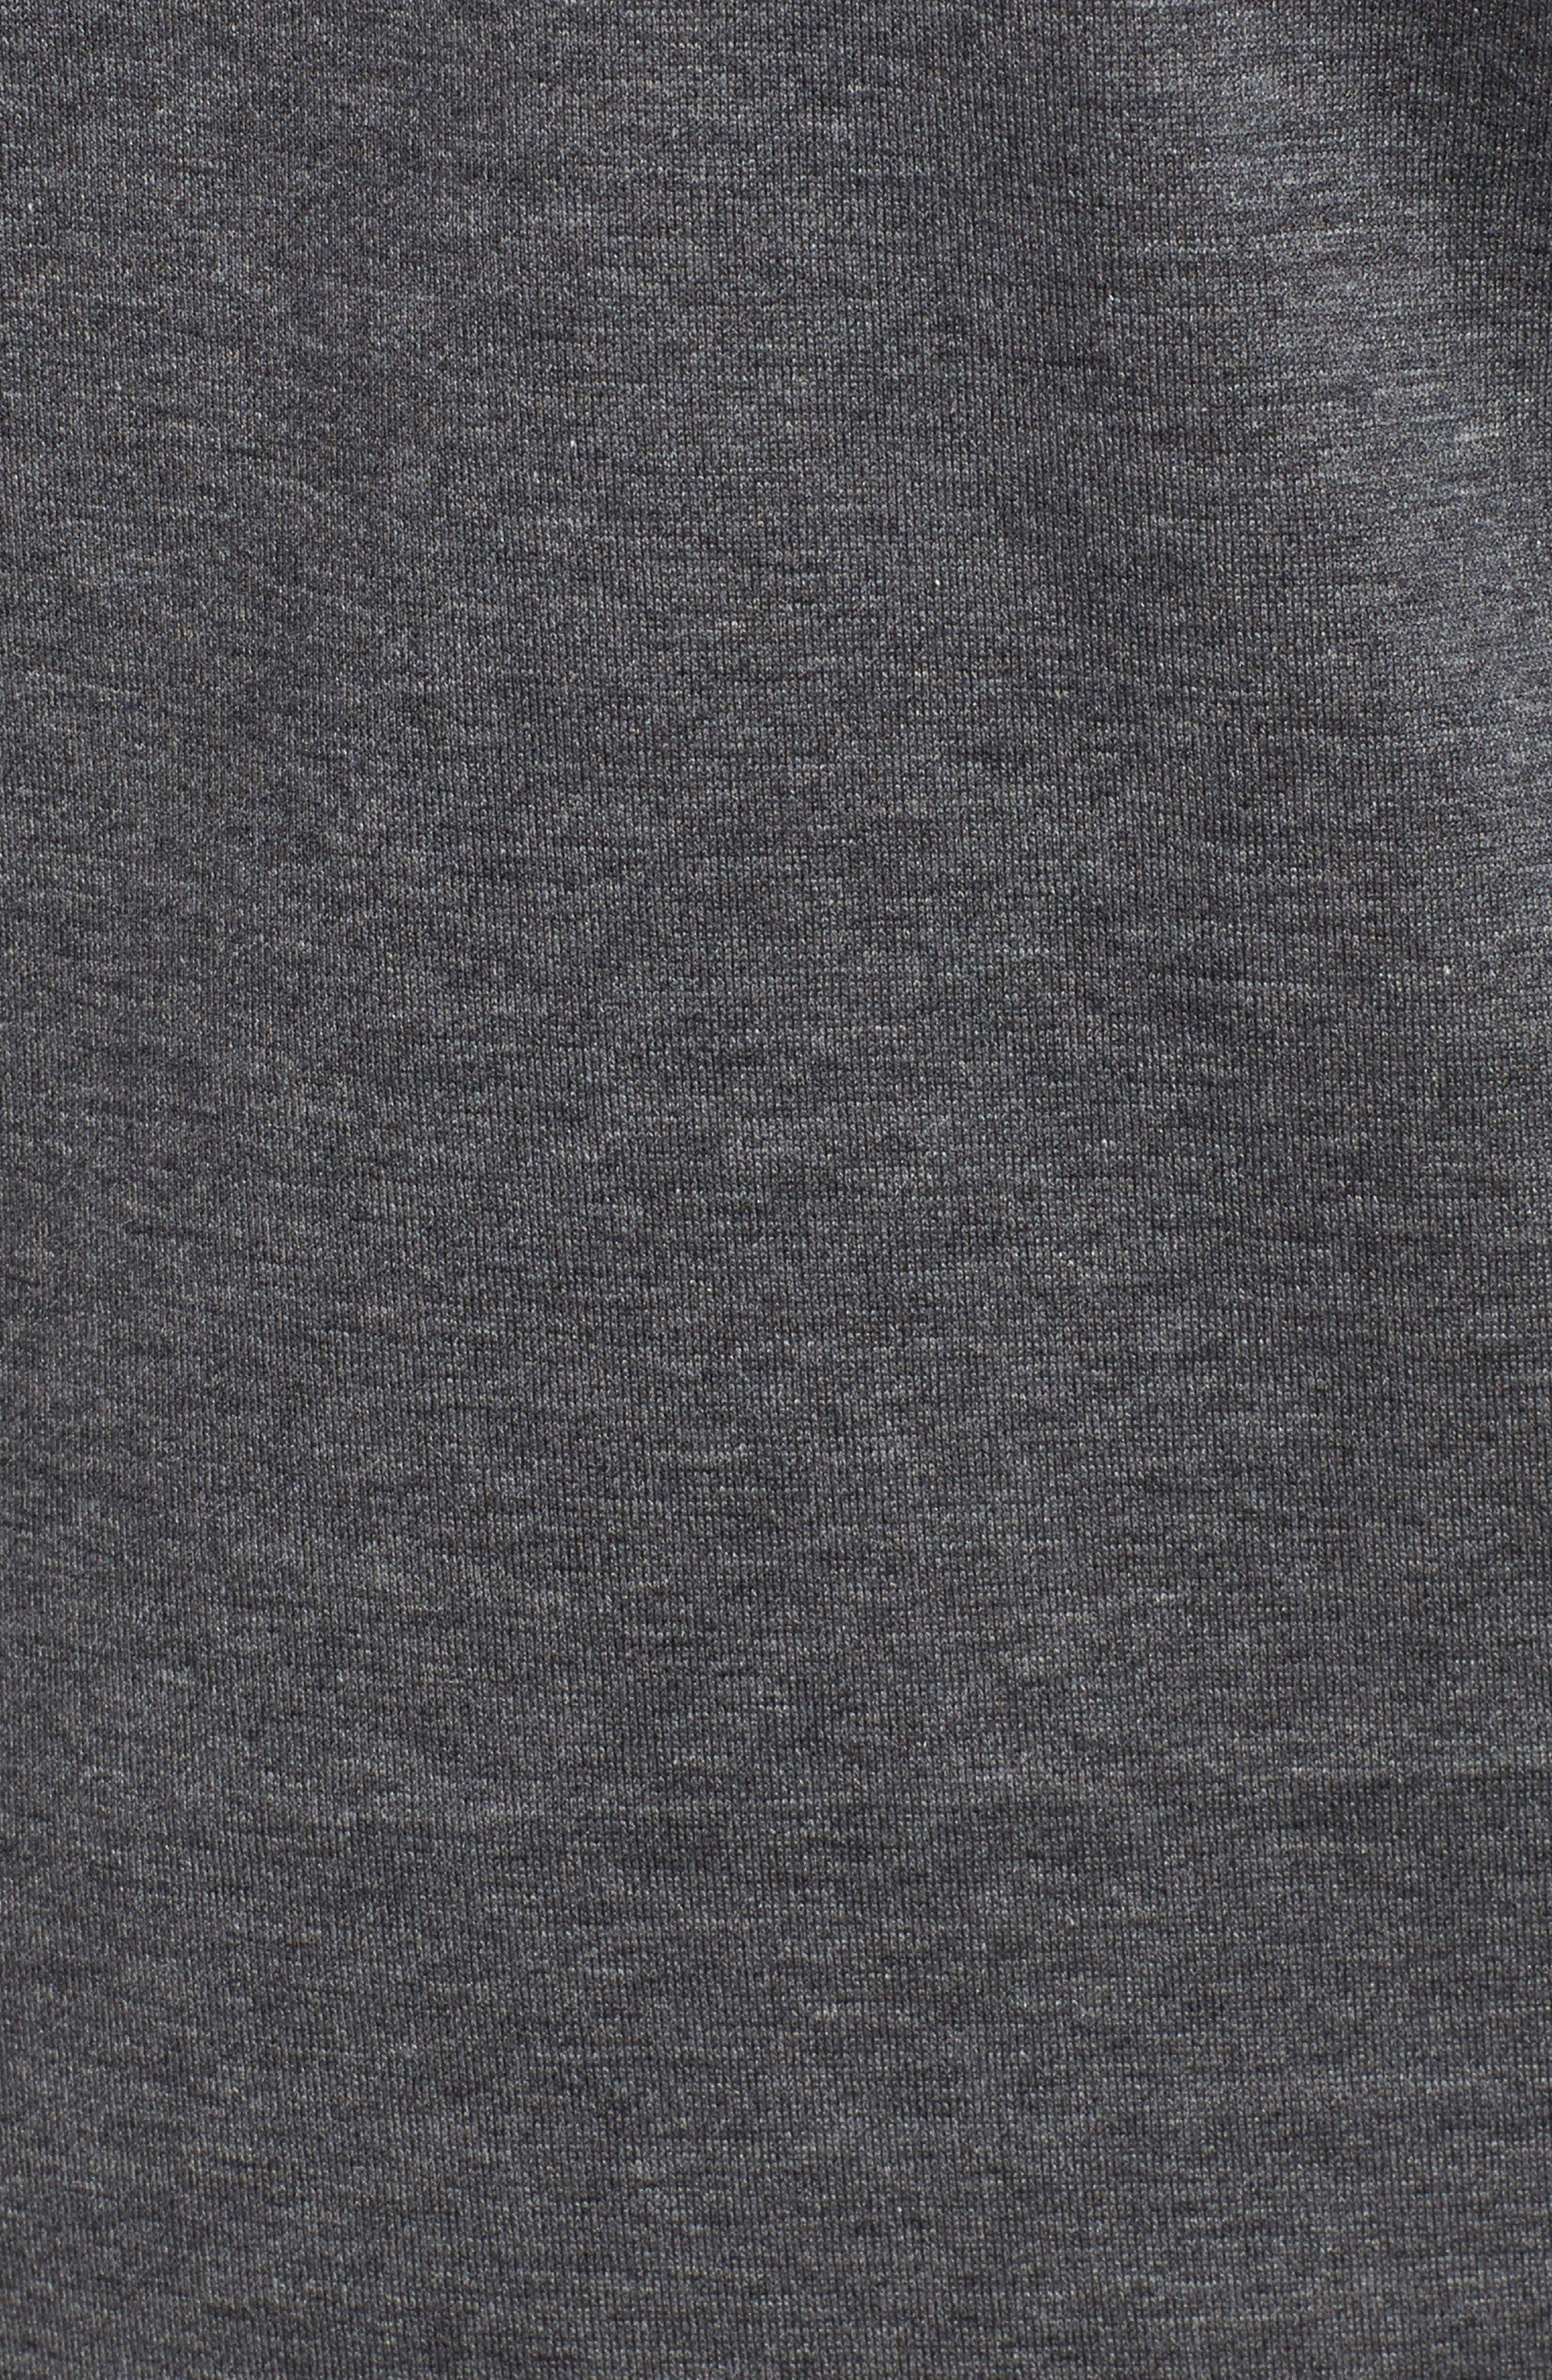 Tenison Slim Fit Ombre Check Long Sleeve T-shirt,                             Alternate thumbnail 5, color,                             030